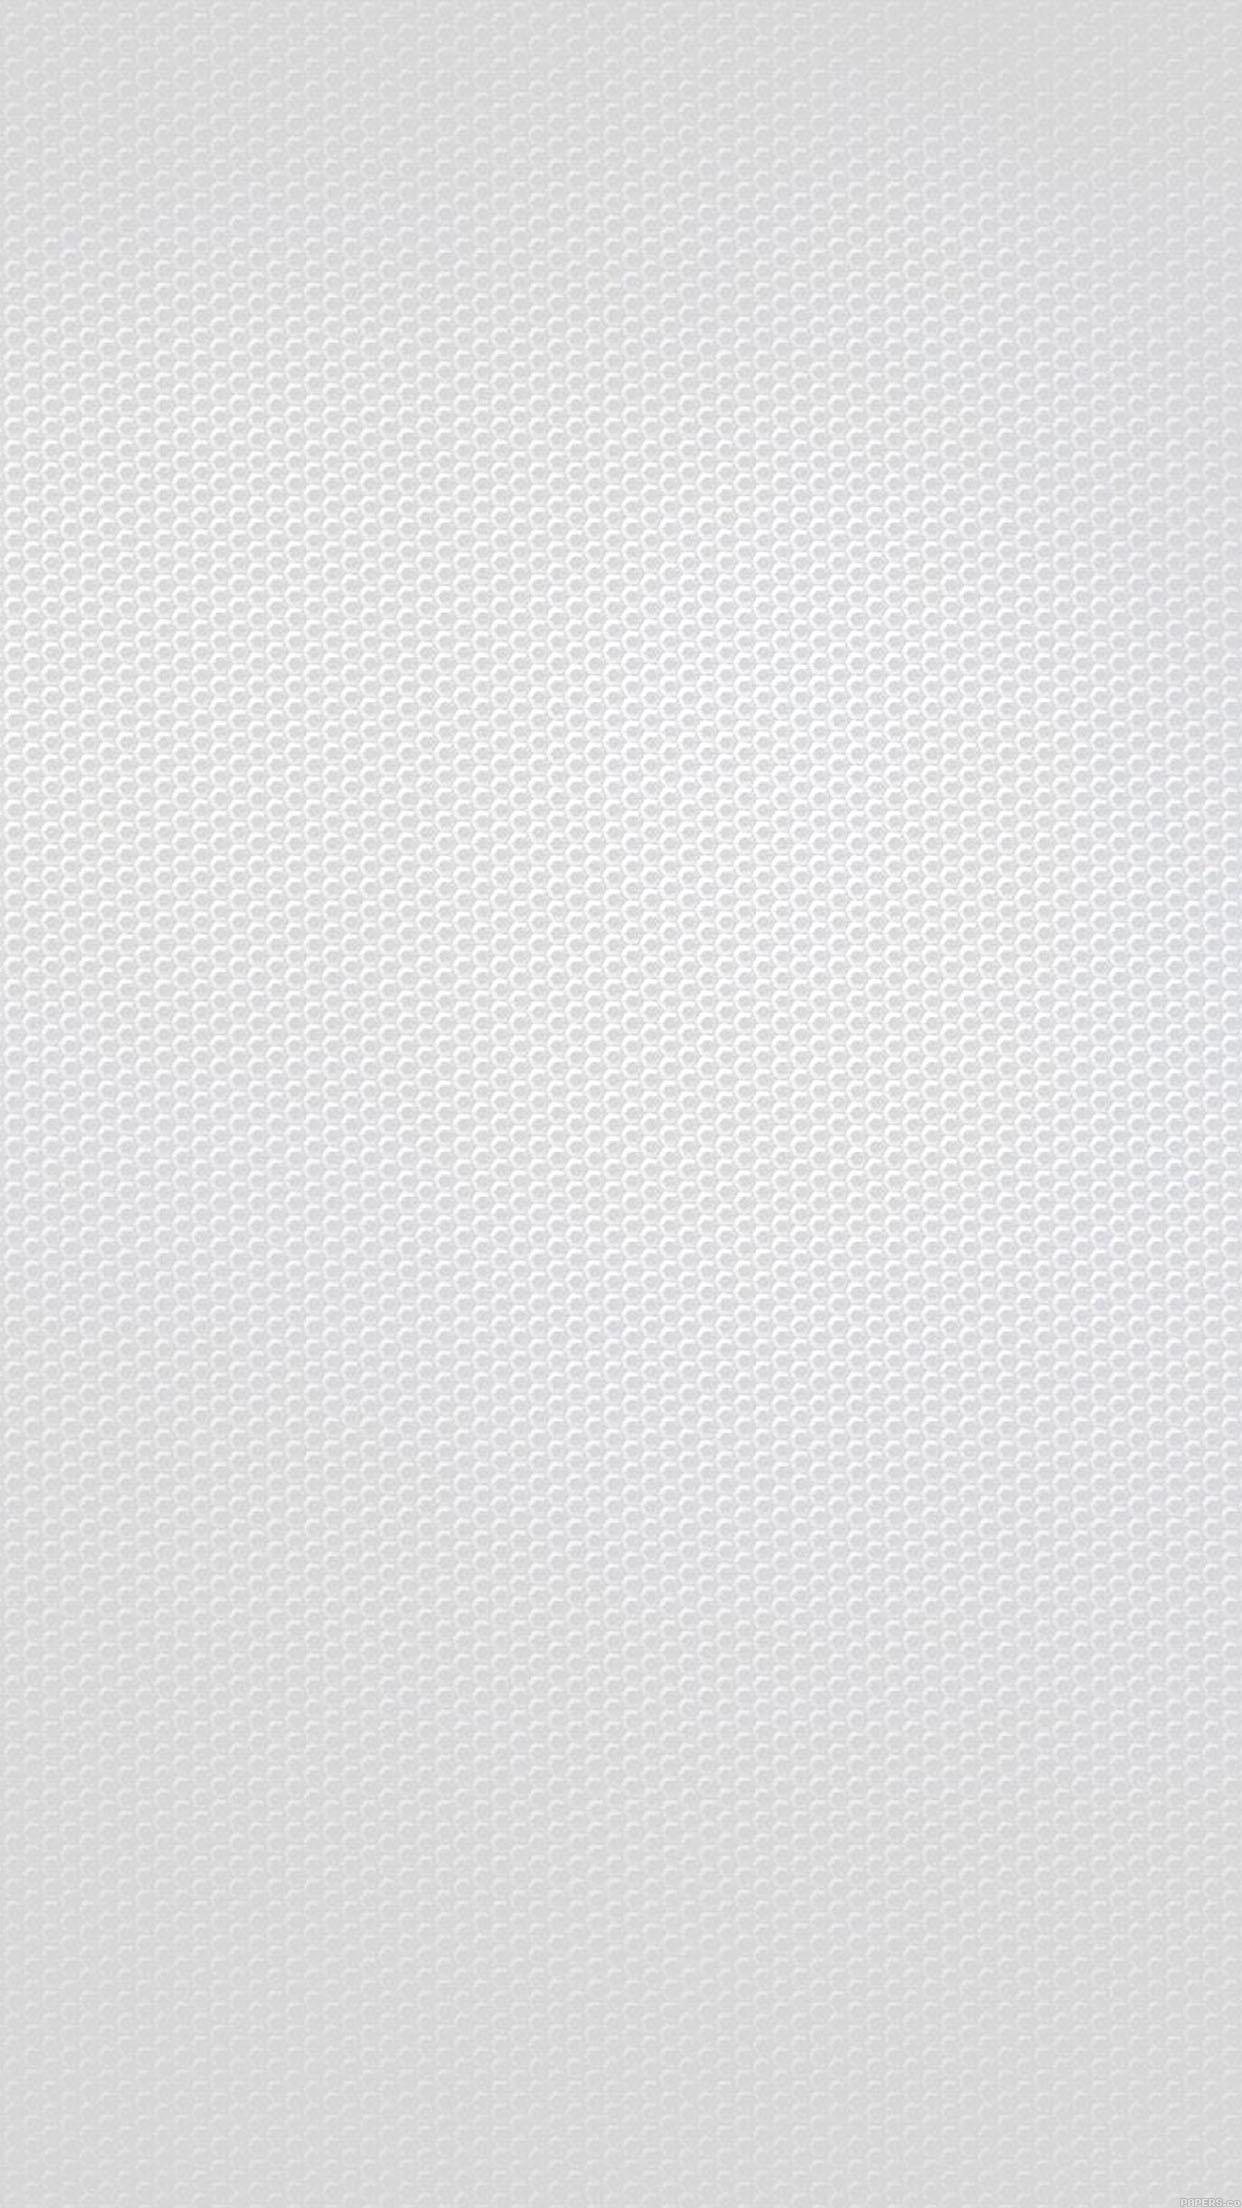 Carbon Fibre Iphone X Wallpaper Va68 Wallpaper Carbon Pattern White Pattern Papers Co